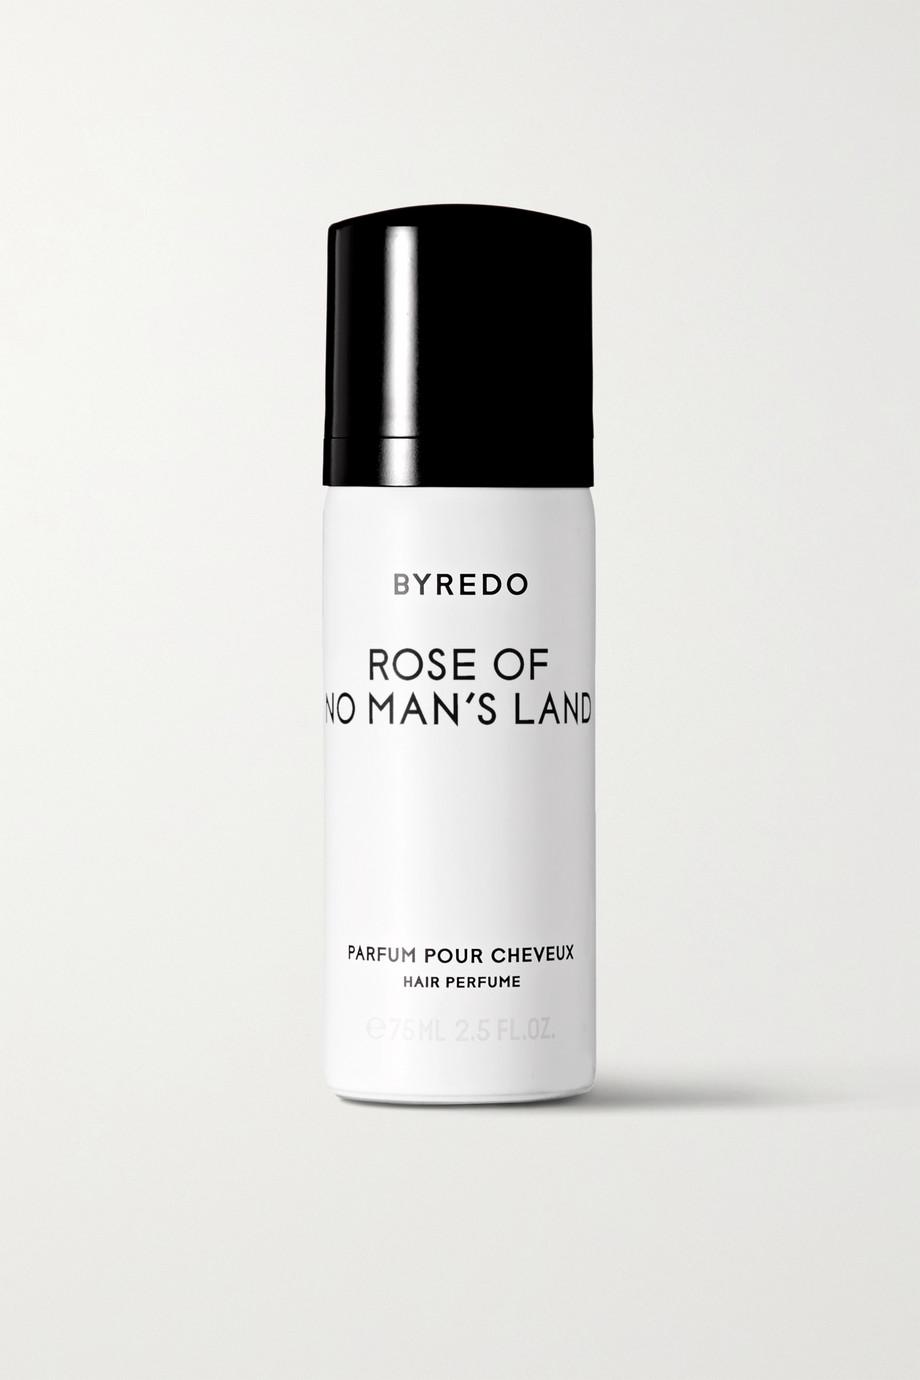 Byredo Hair Perfume - Rose of No Man's Land, 75ml